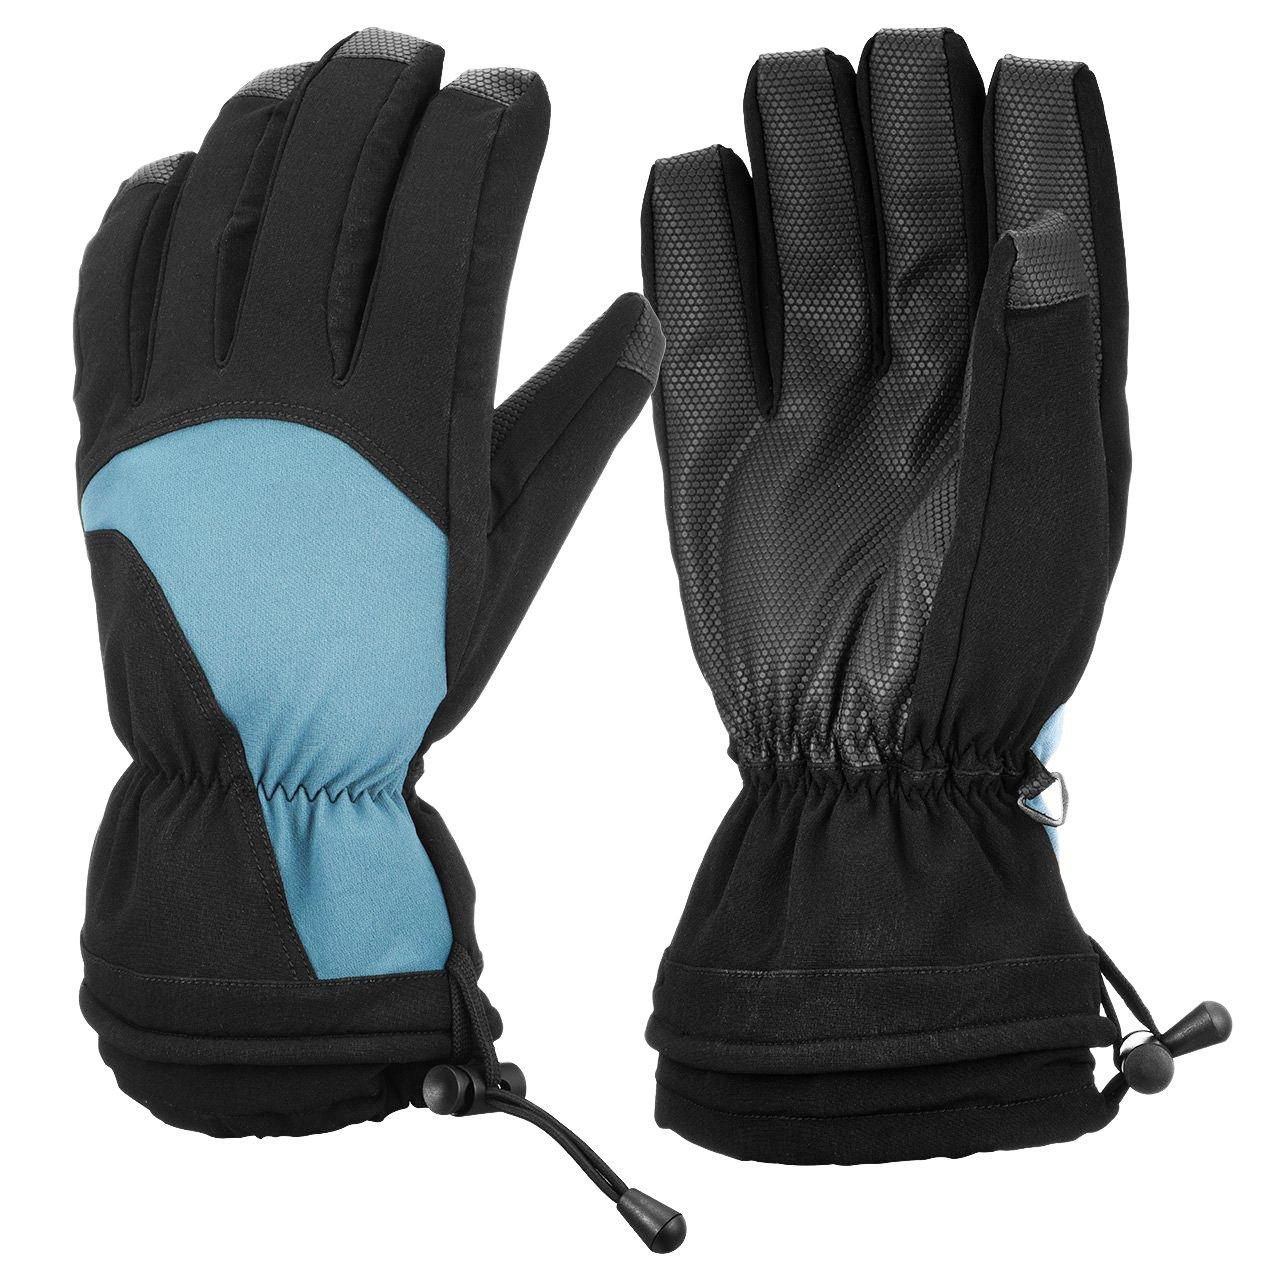 51c236076e Skihandschuhe, OMORC Ski Handschuhe Warm Wasserdicht Skifahren Handschuhe  für Herren Fahrrad Skifahren Warm Handschuhe Outdoor